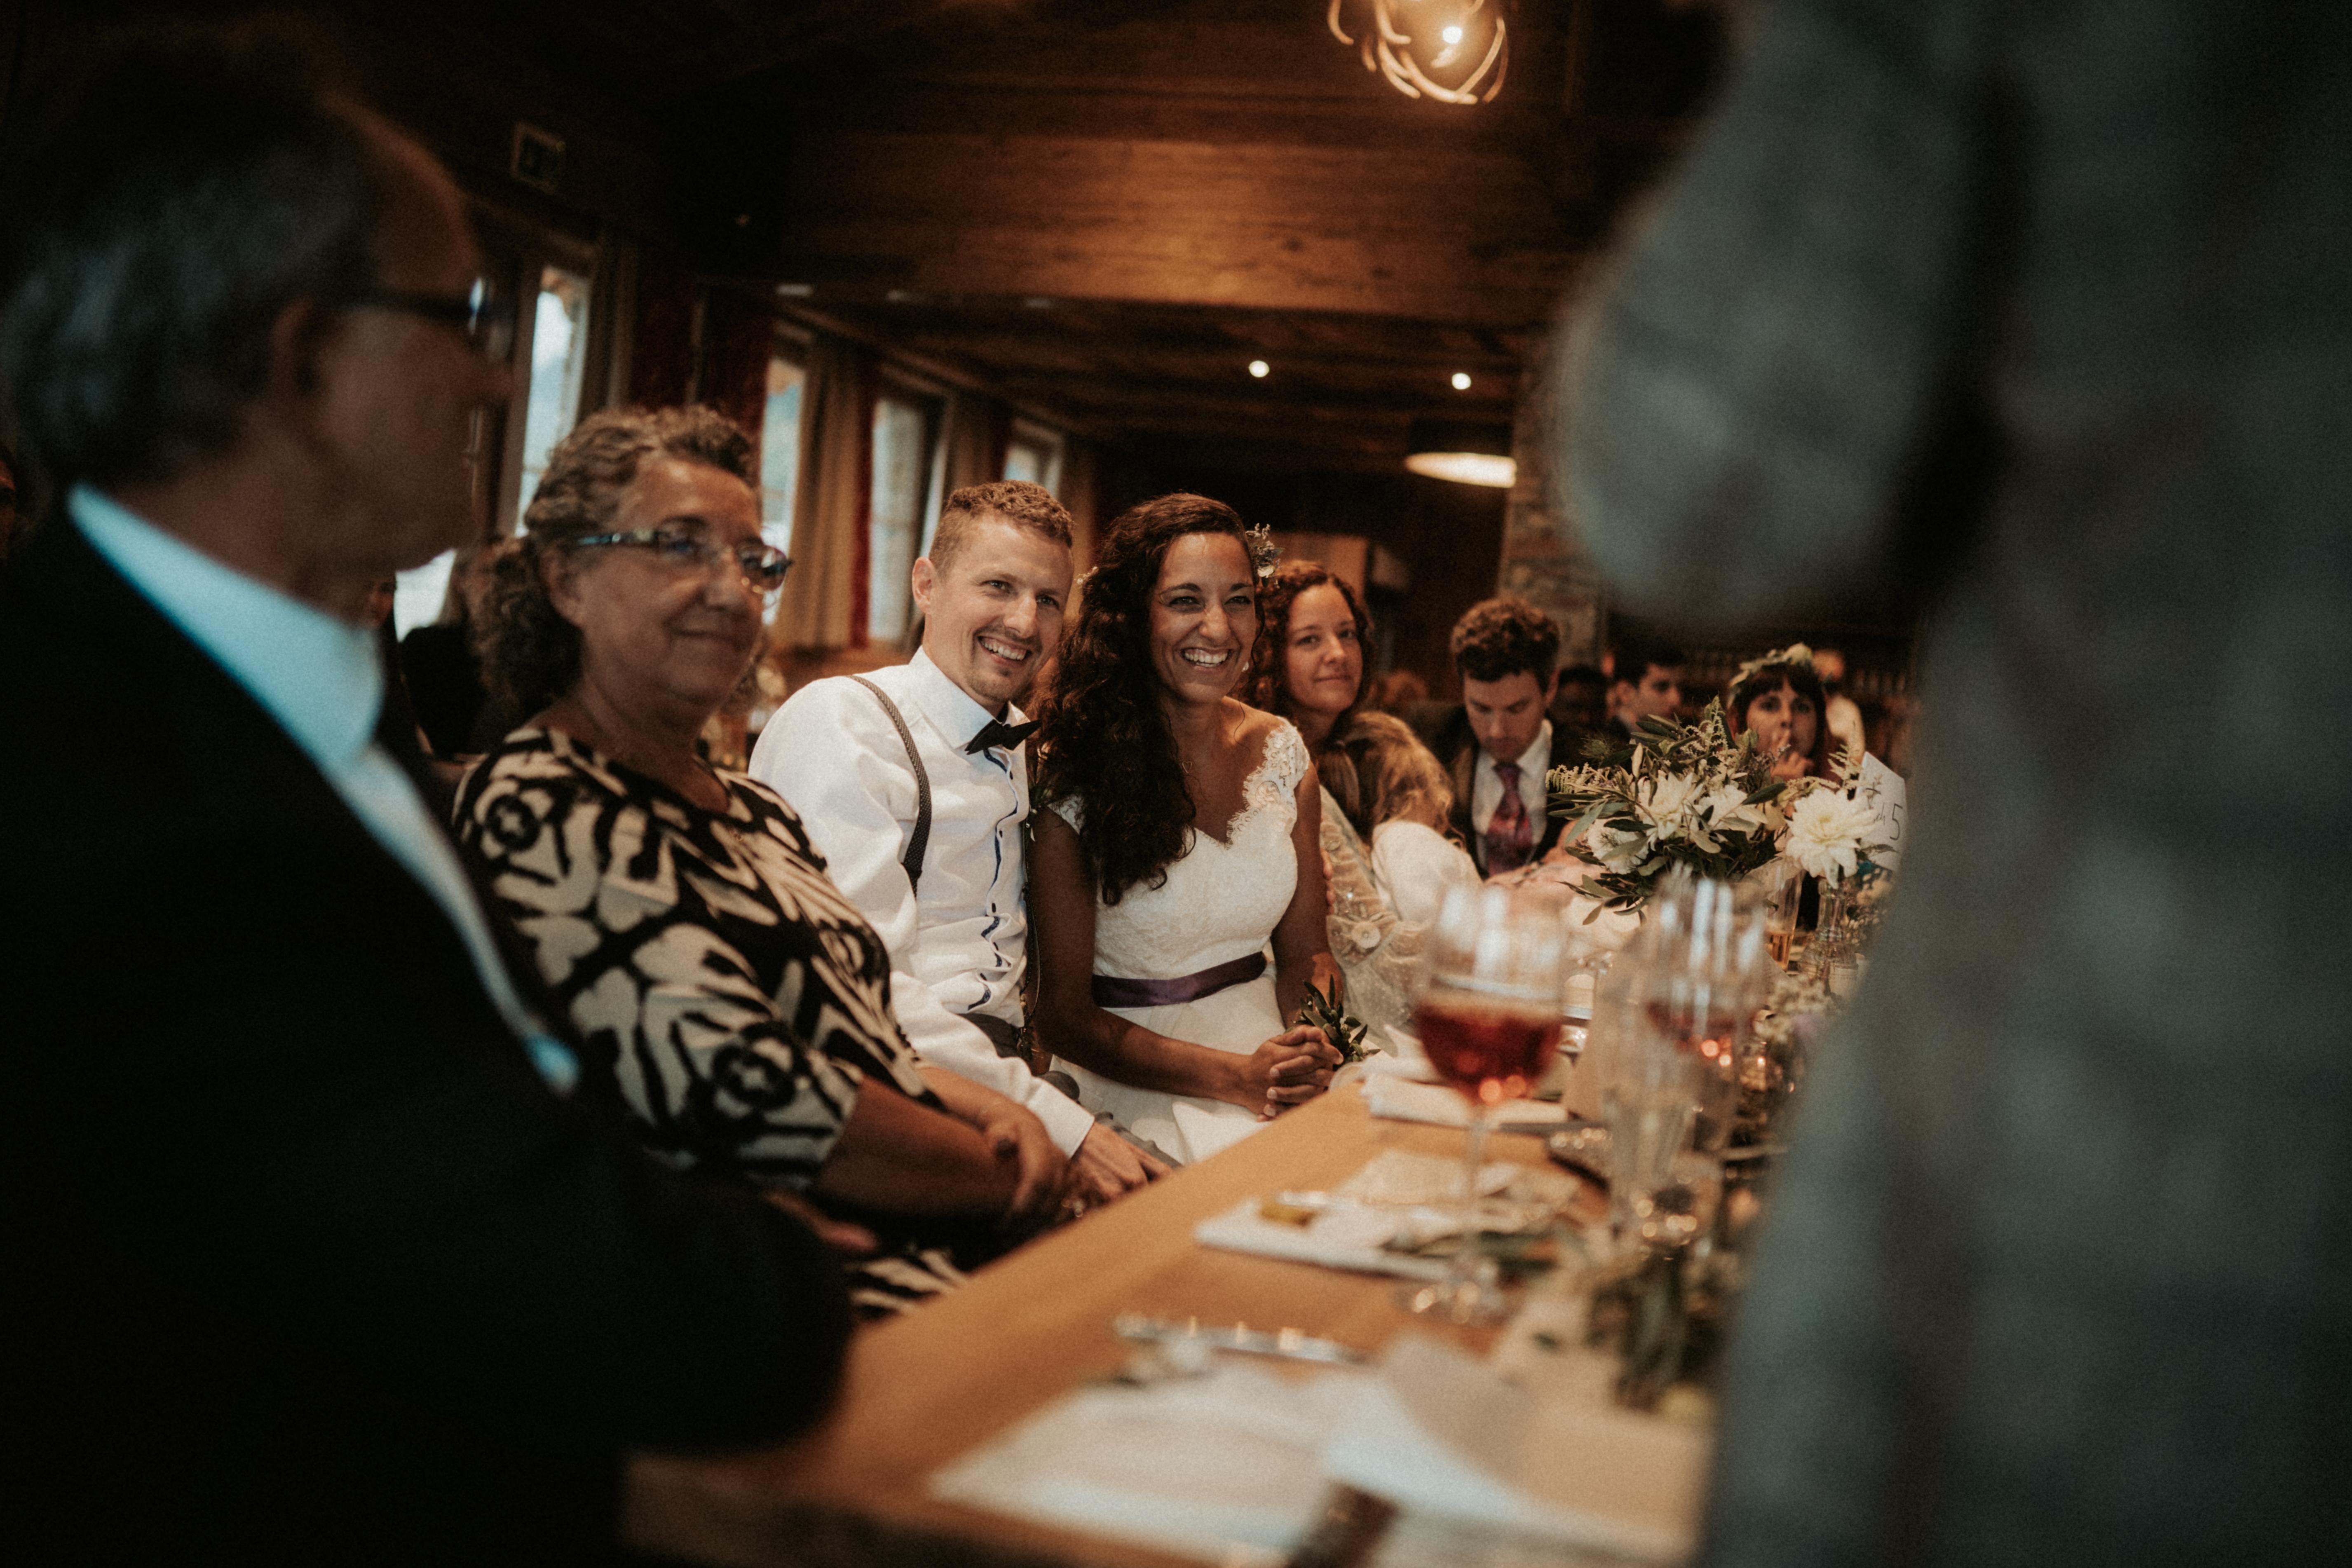 wedding_29.08.20-72